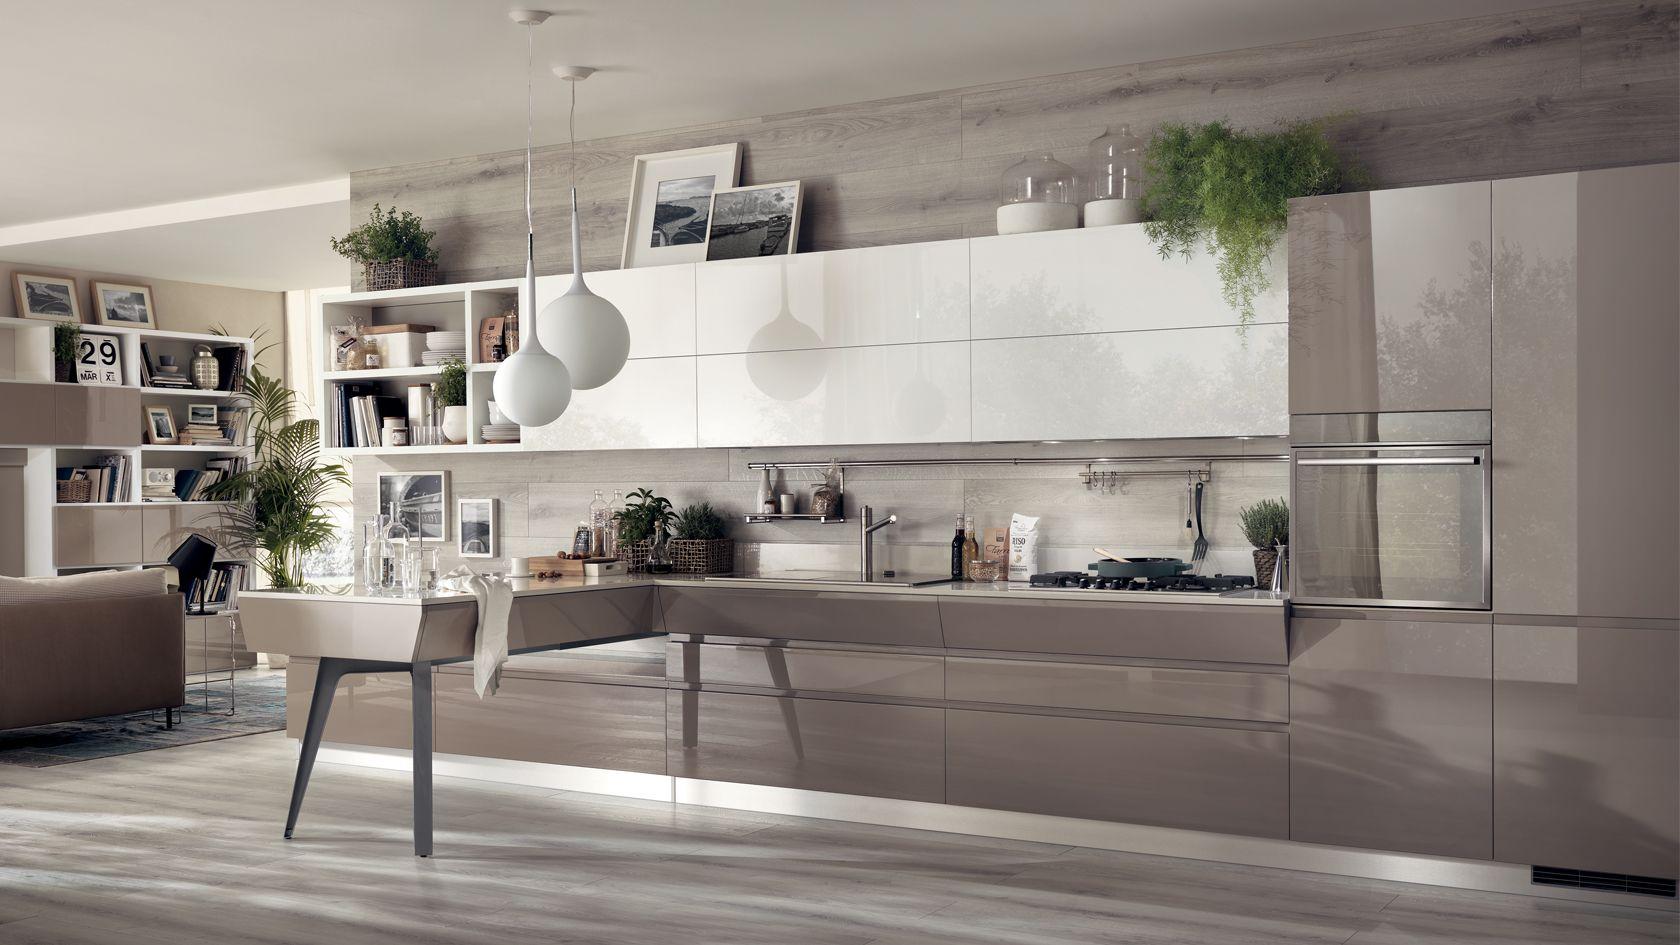 Rivestimento Cucina Rovere Grigio : Rivestimento cucina rovere ...